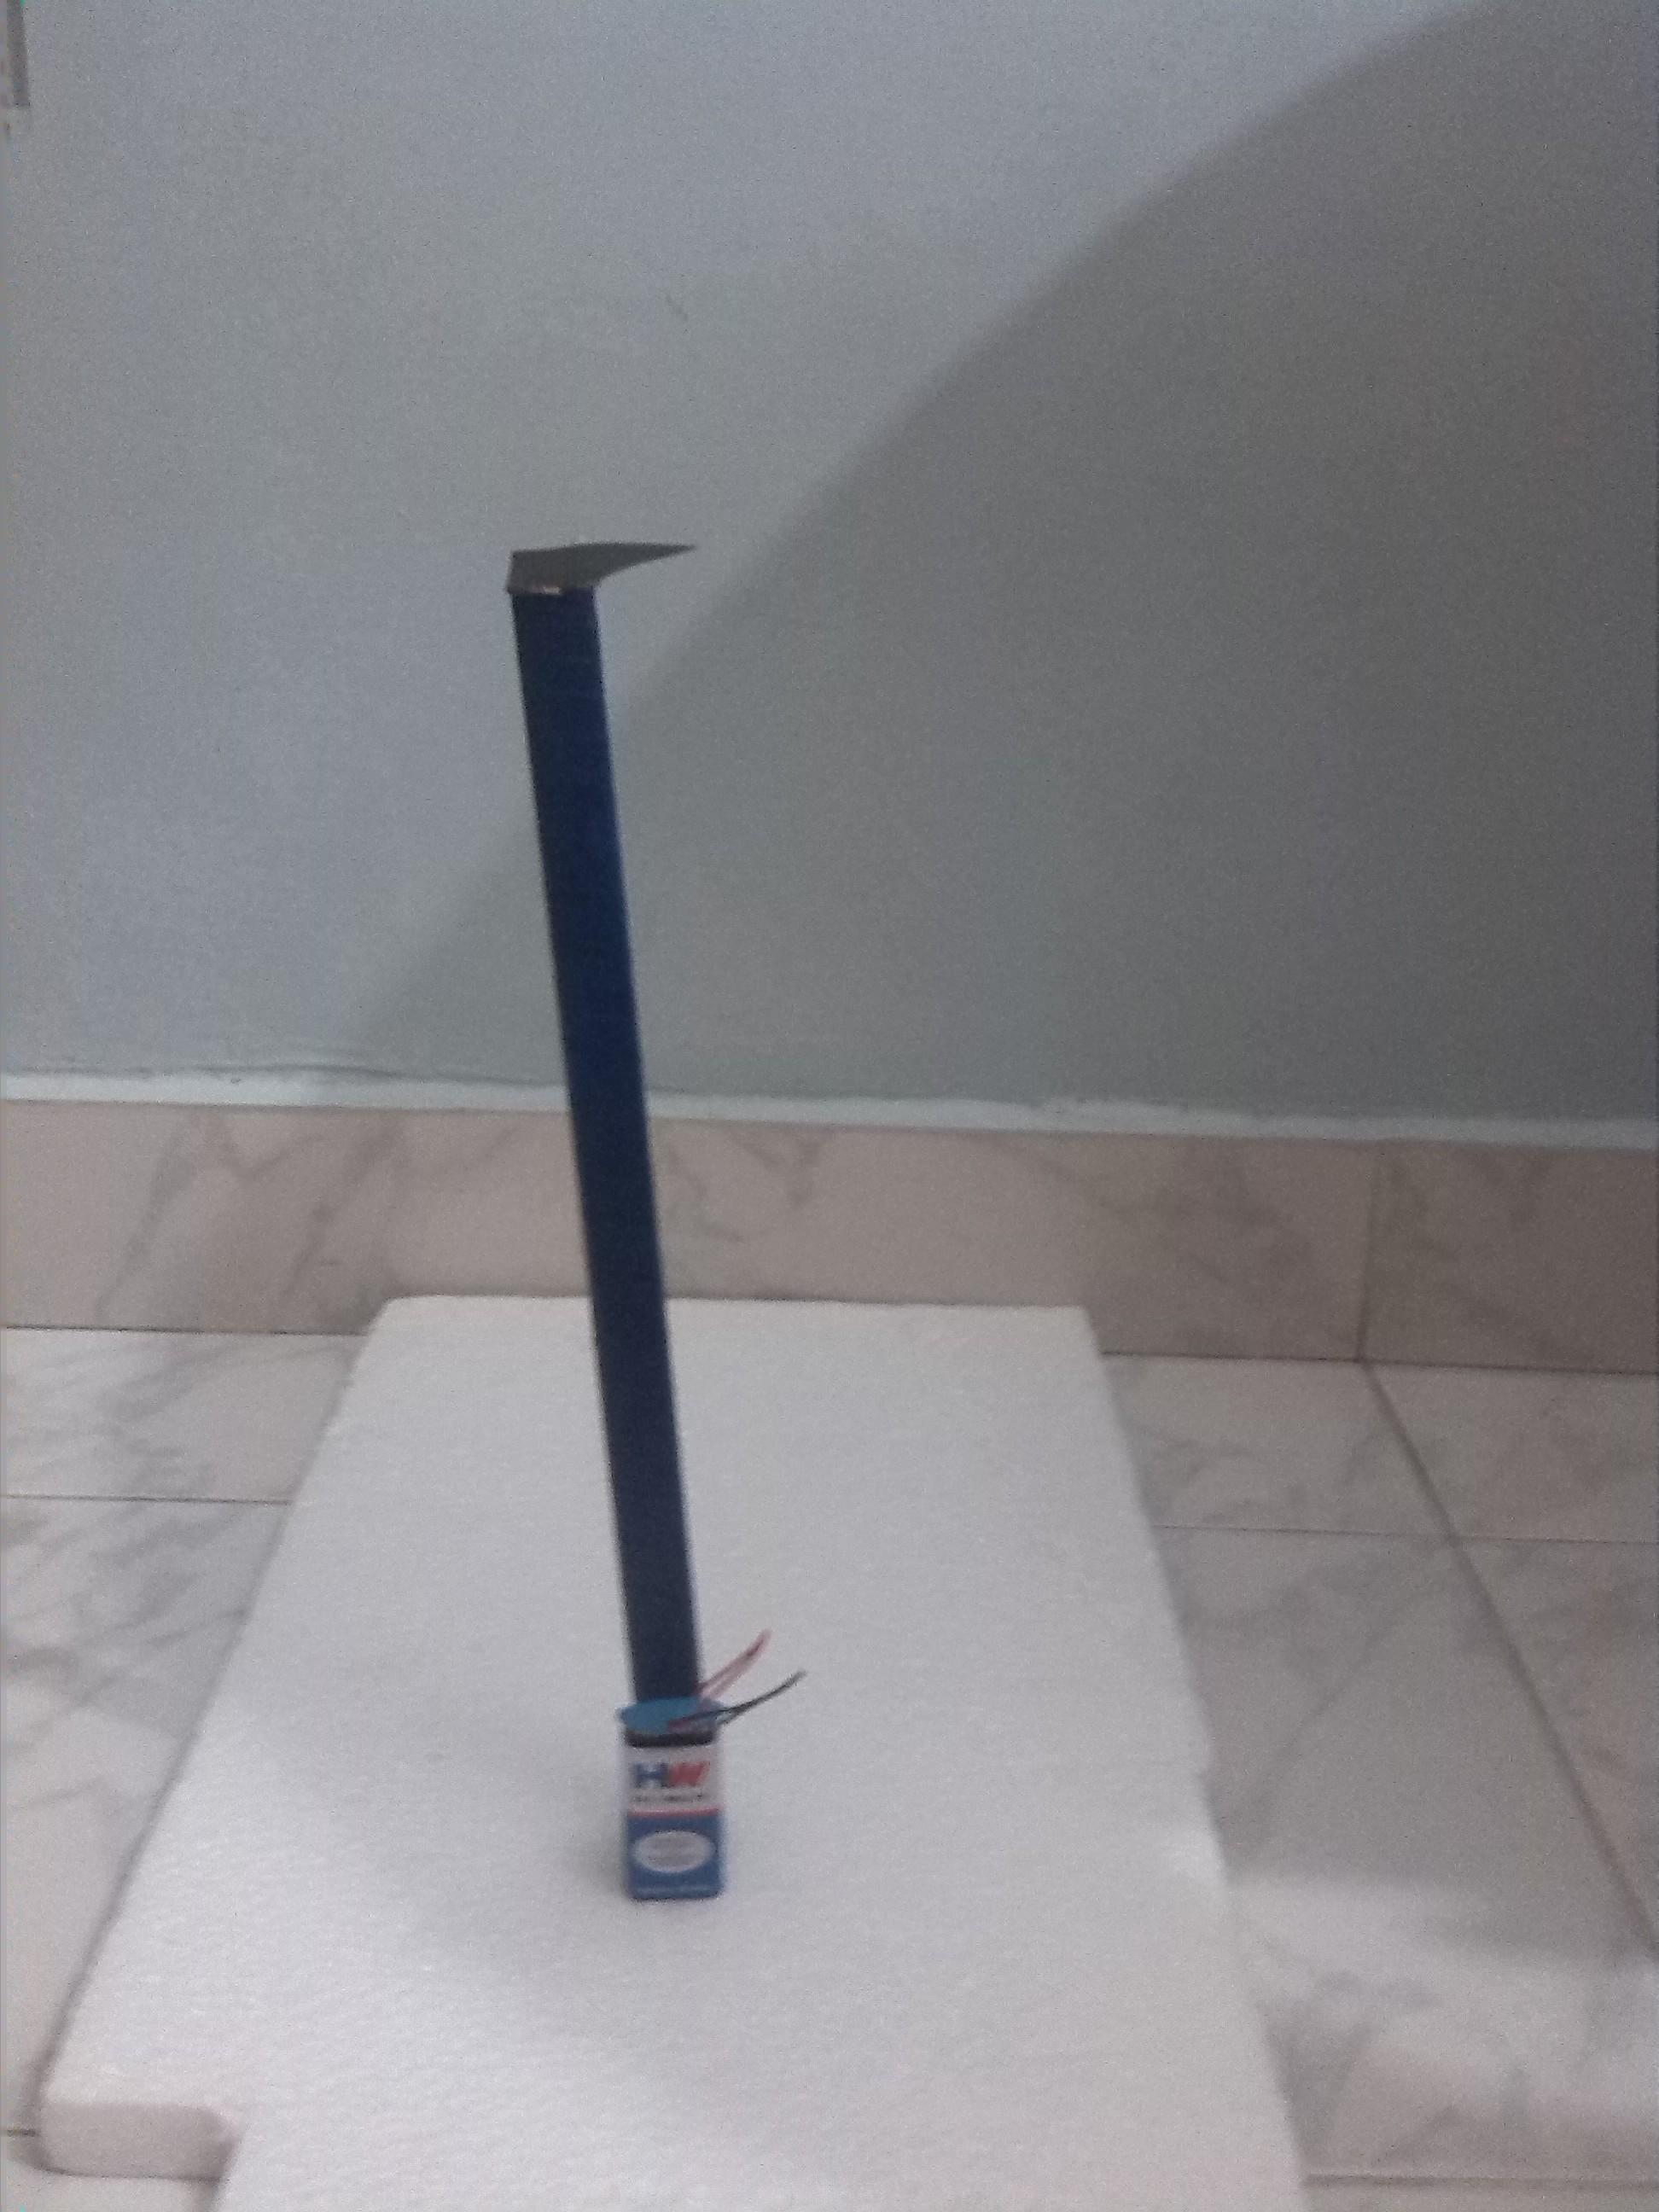 Automatic Street Light Using Ldr: 4 Steps